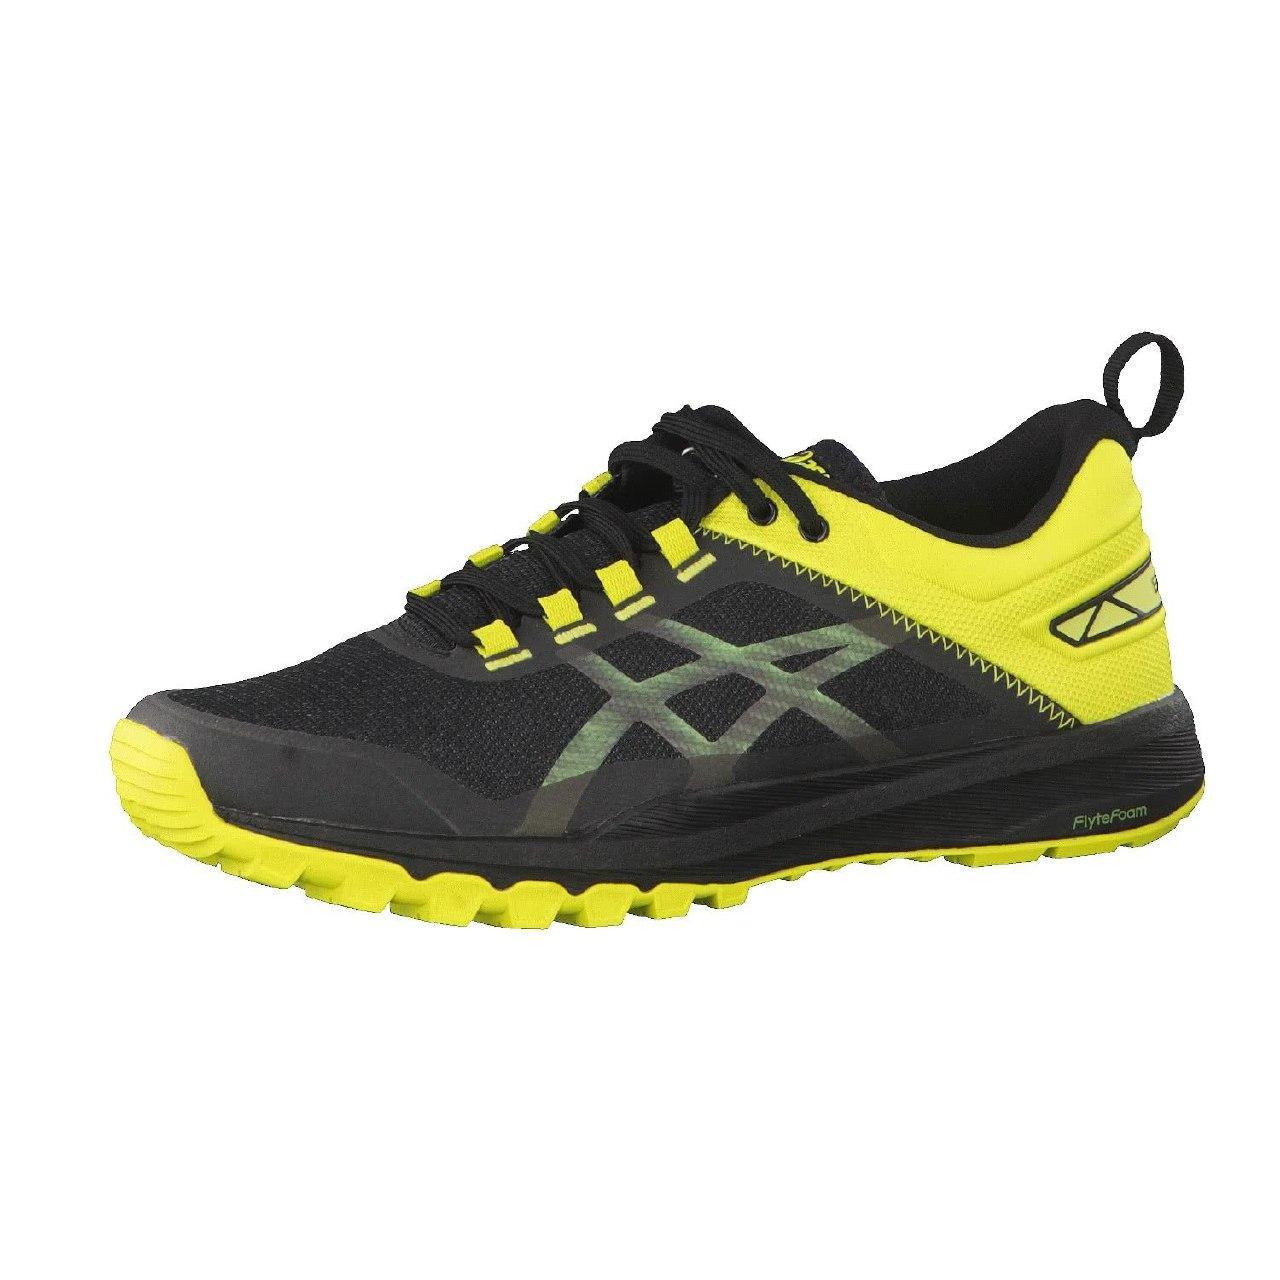 ASICS Gecko XT T826n-9097, Zapatillas de Running para Hombre talla 39. Y talla 44.5-59.53€